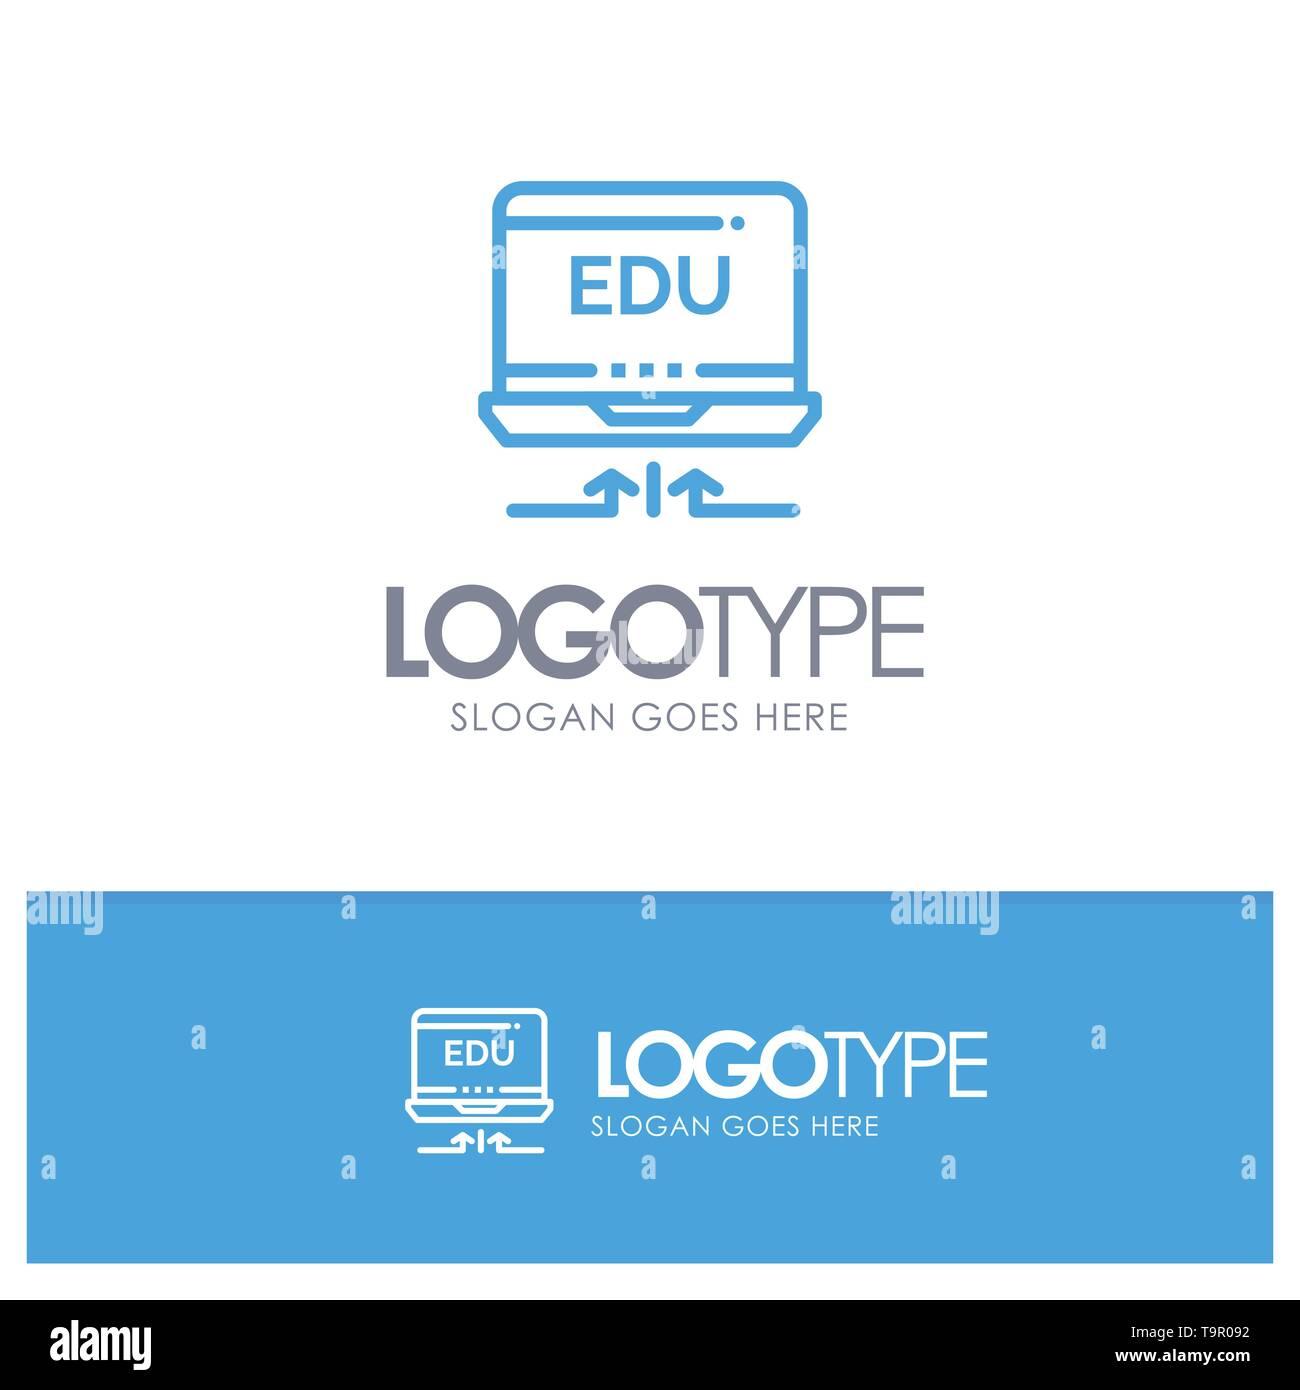 Laptop, Hardware, Arrow, Education Blue Logo Line Style - Stock Image